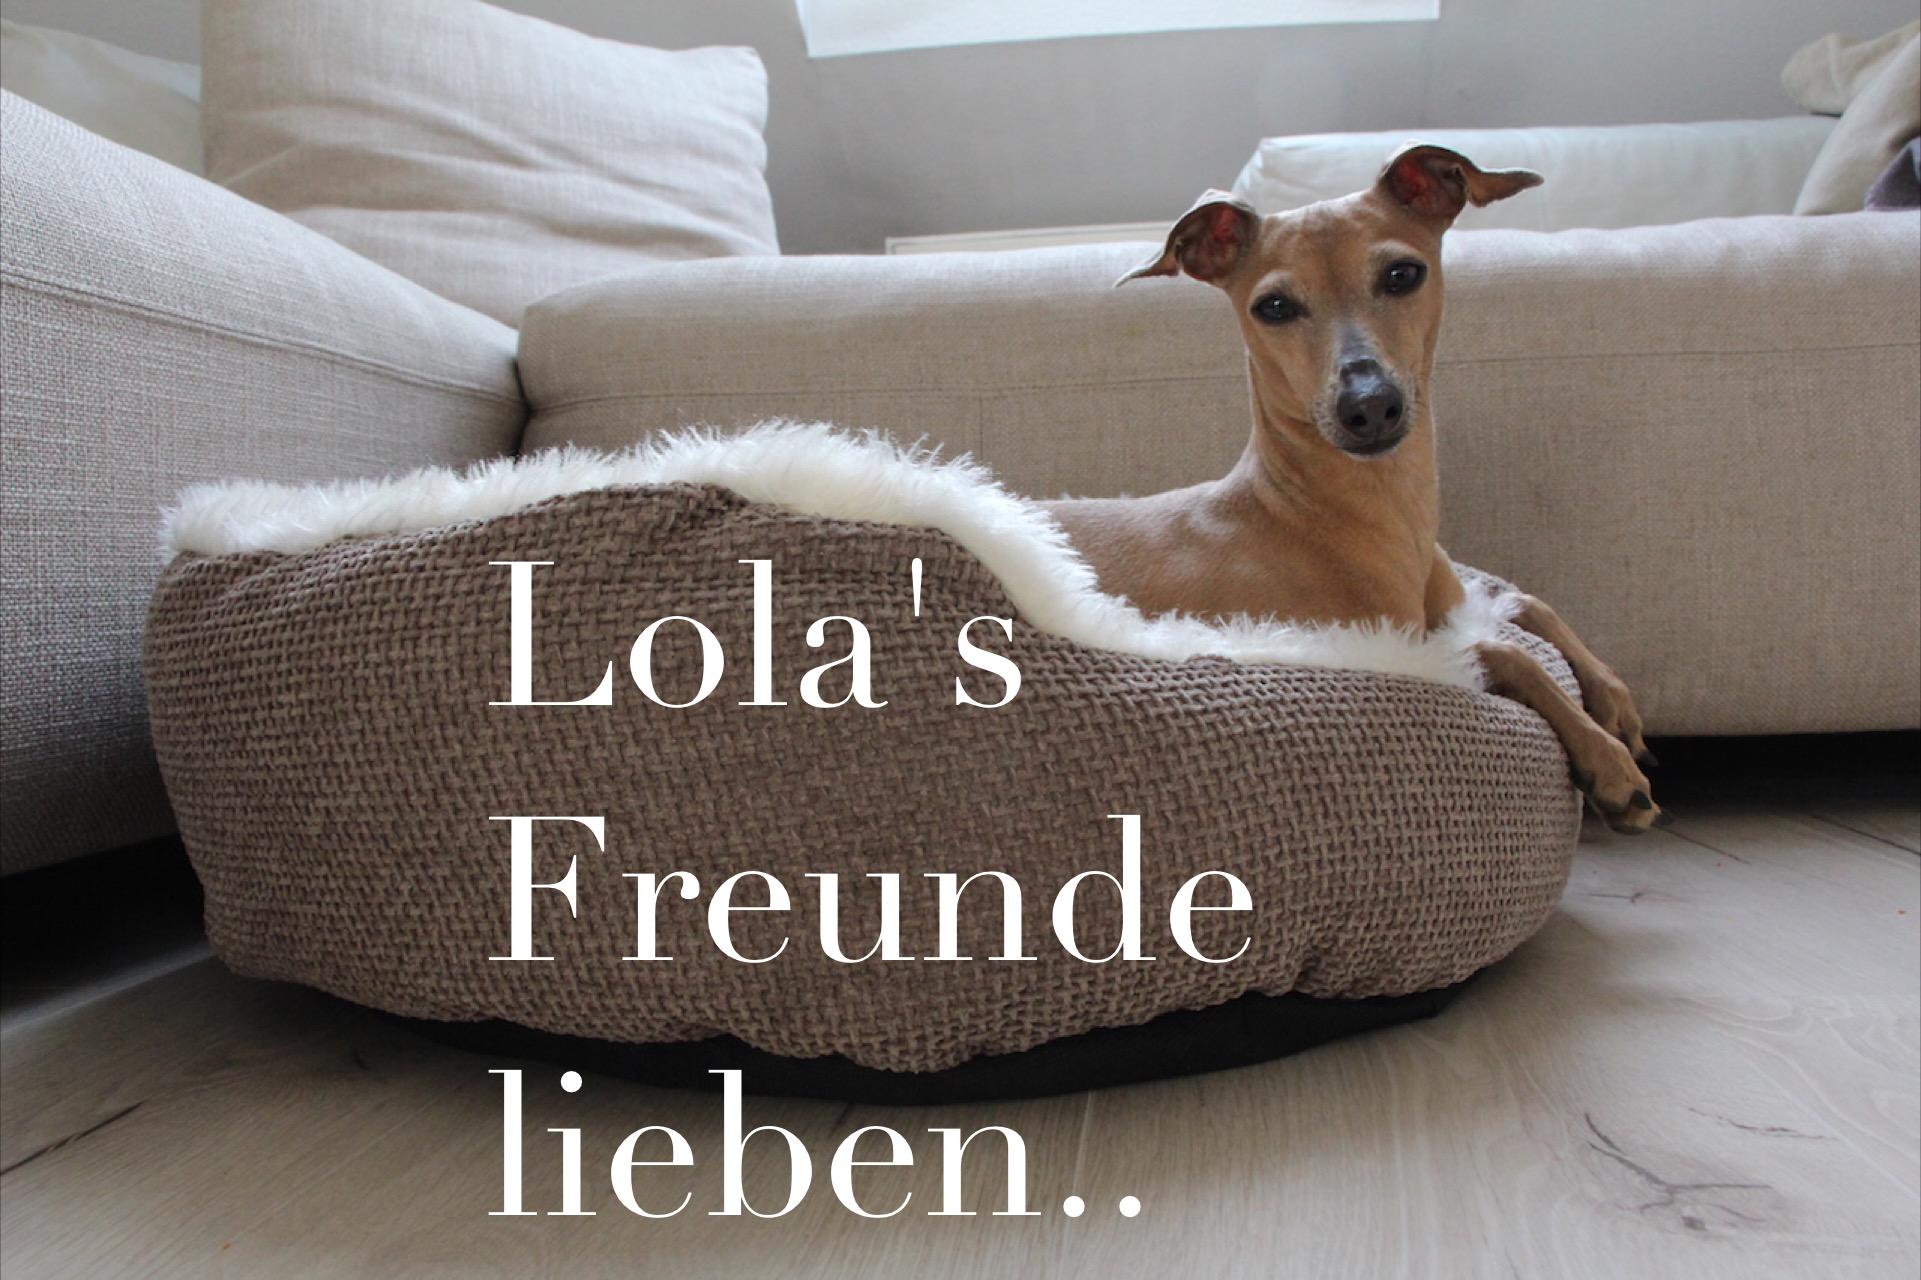 Lola's Freunde lieben Hundeblog miDoggy